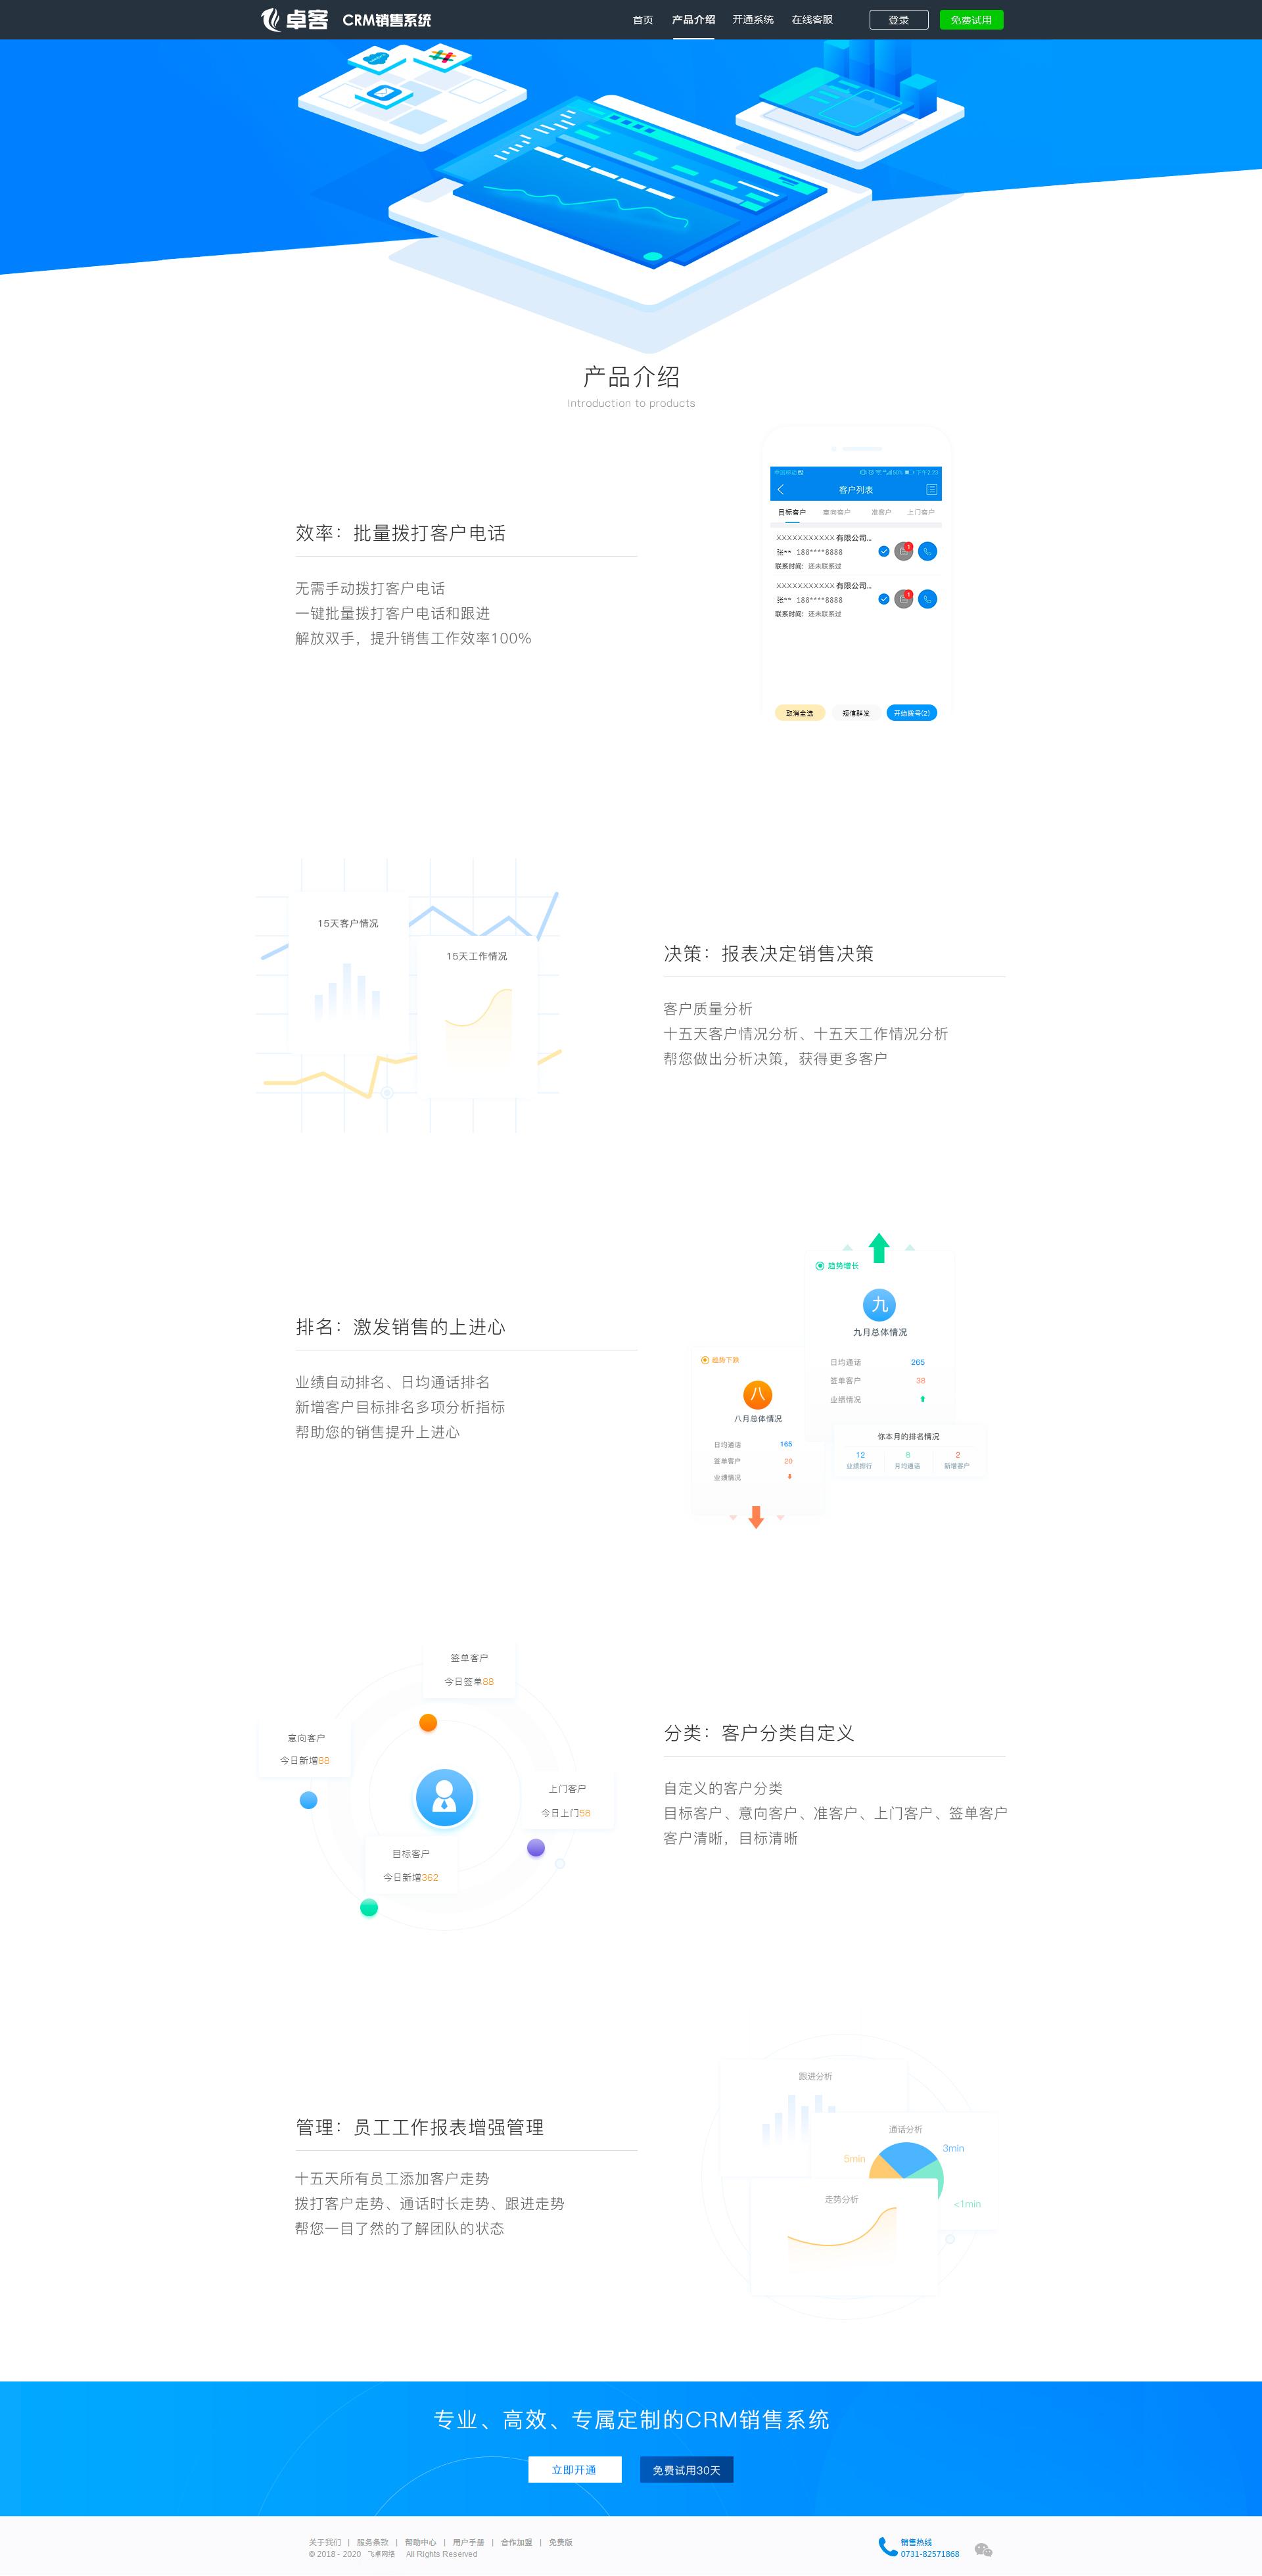 CRM官网首页-产品介绍.jpg